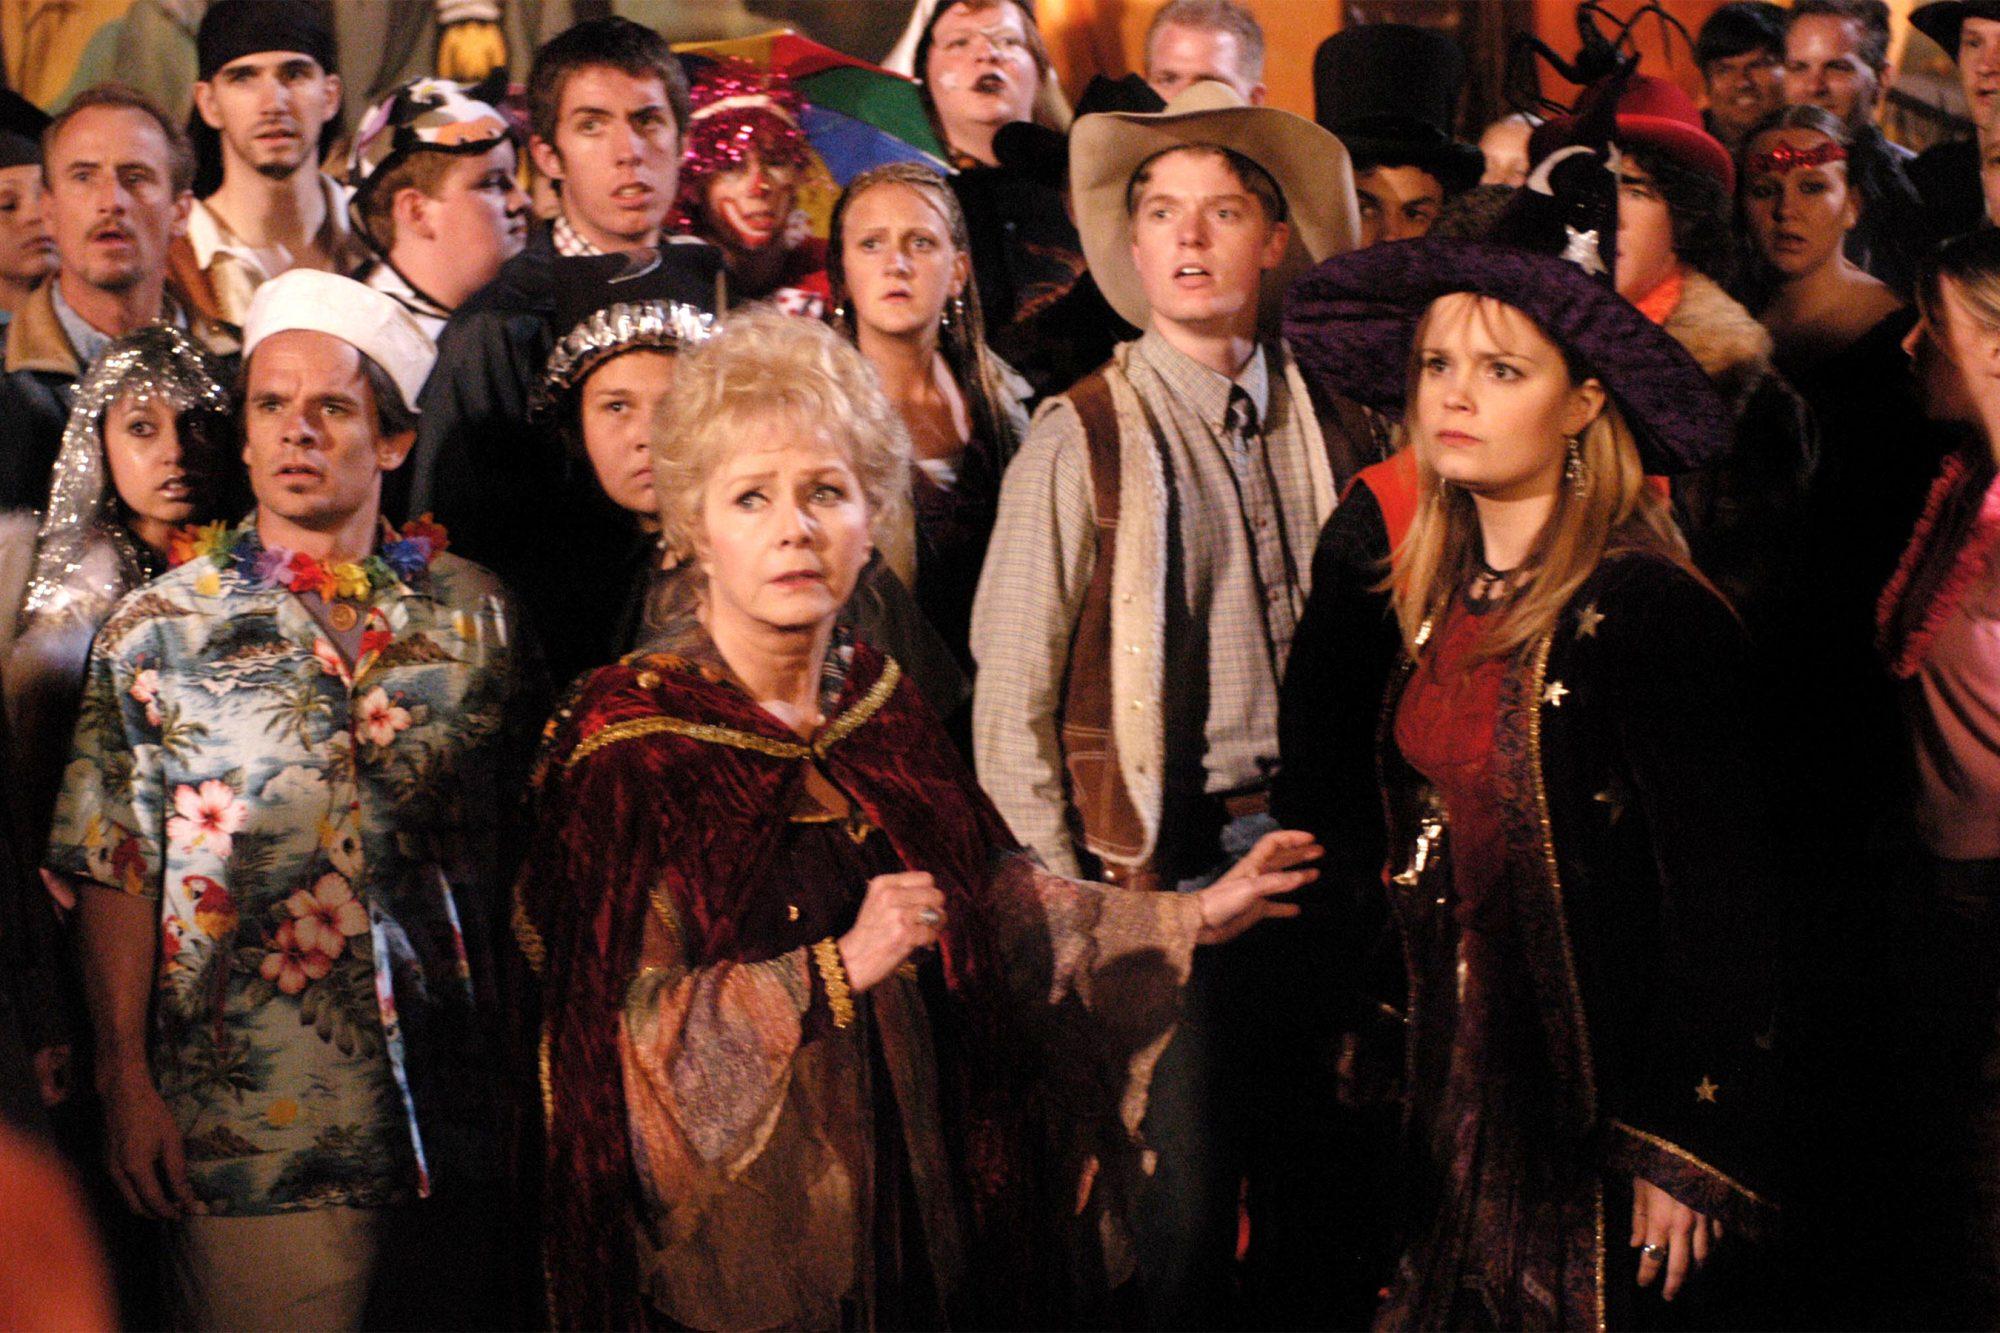 Halloweentown High - 2005